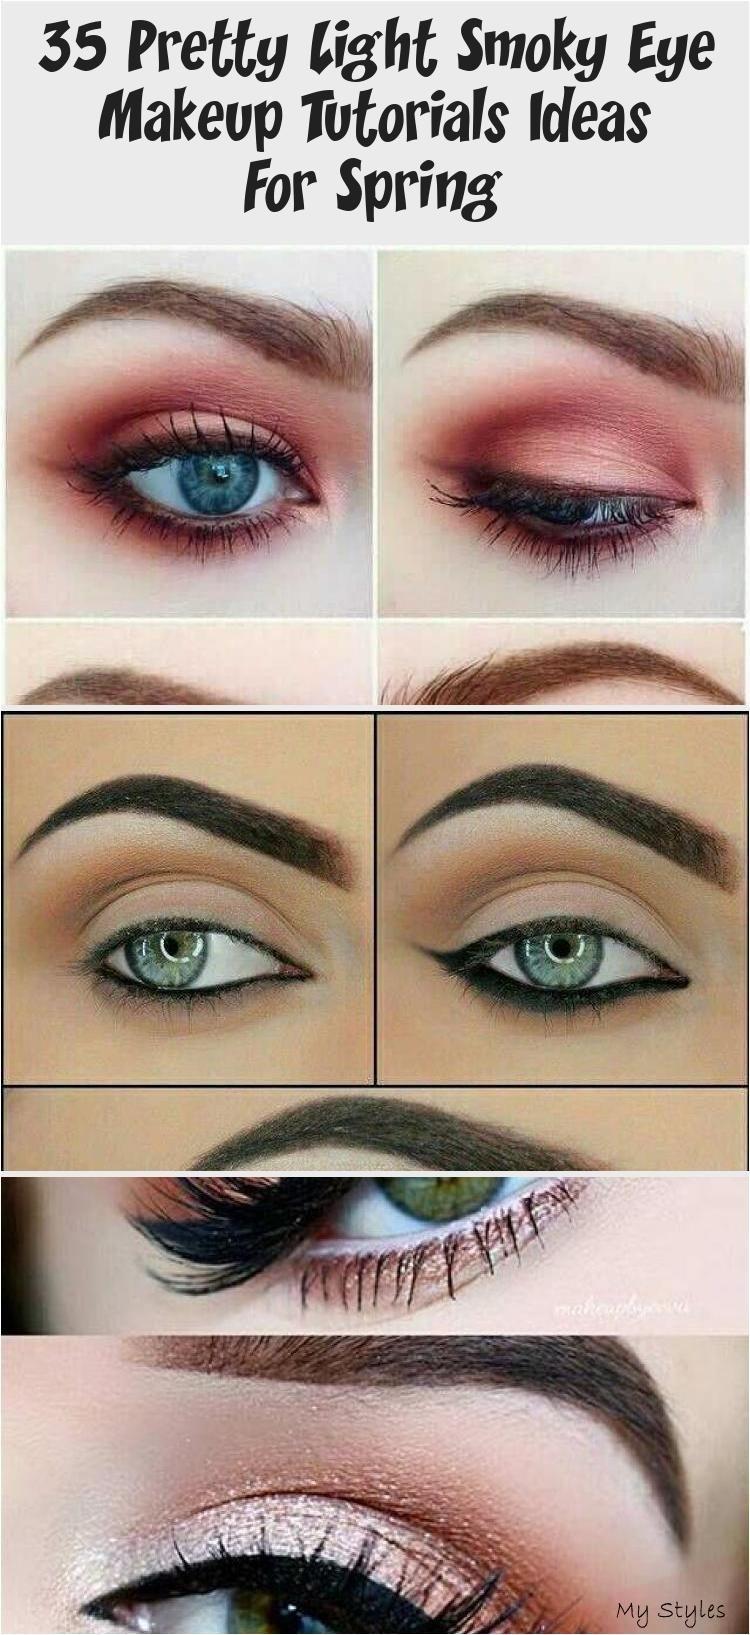 35 Pretty Light Smoky Eye Makeup Tutorials Ideas For Spring